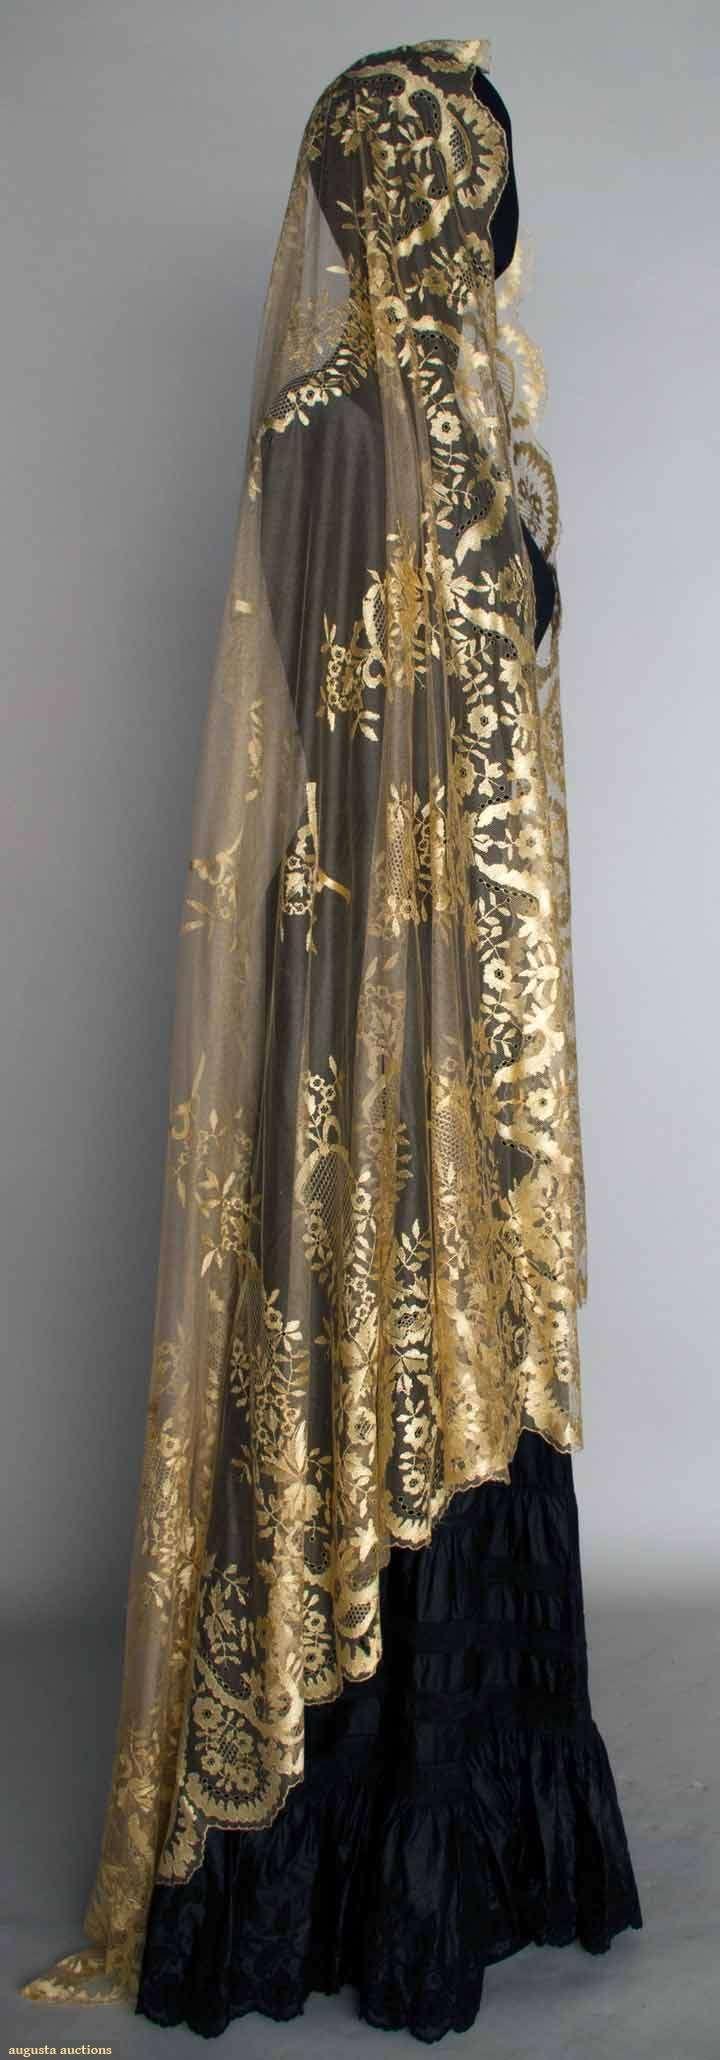 CREAM SILK LACE VEIL, MID 19TH C~Silk reseau w/ hand embroidered & drawnwork silk toile, design of flower garlands, bows, & drawnwork catouches